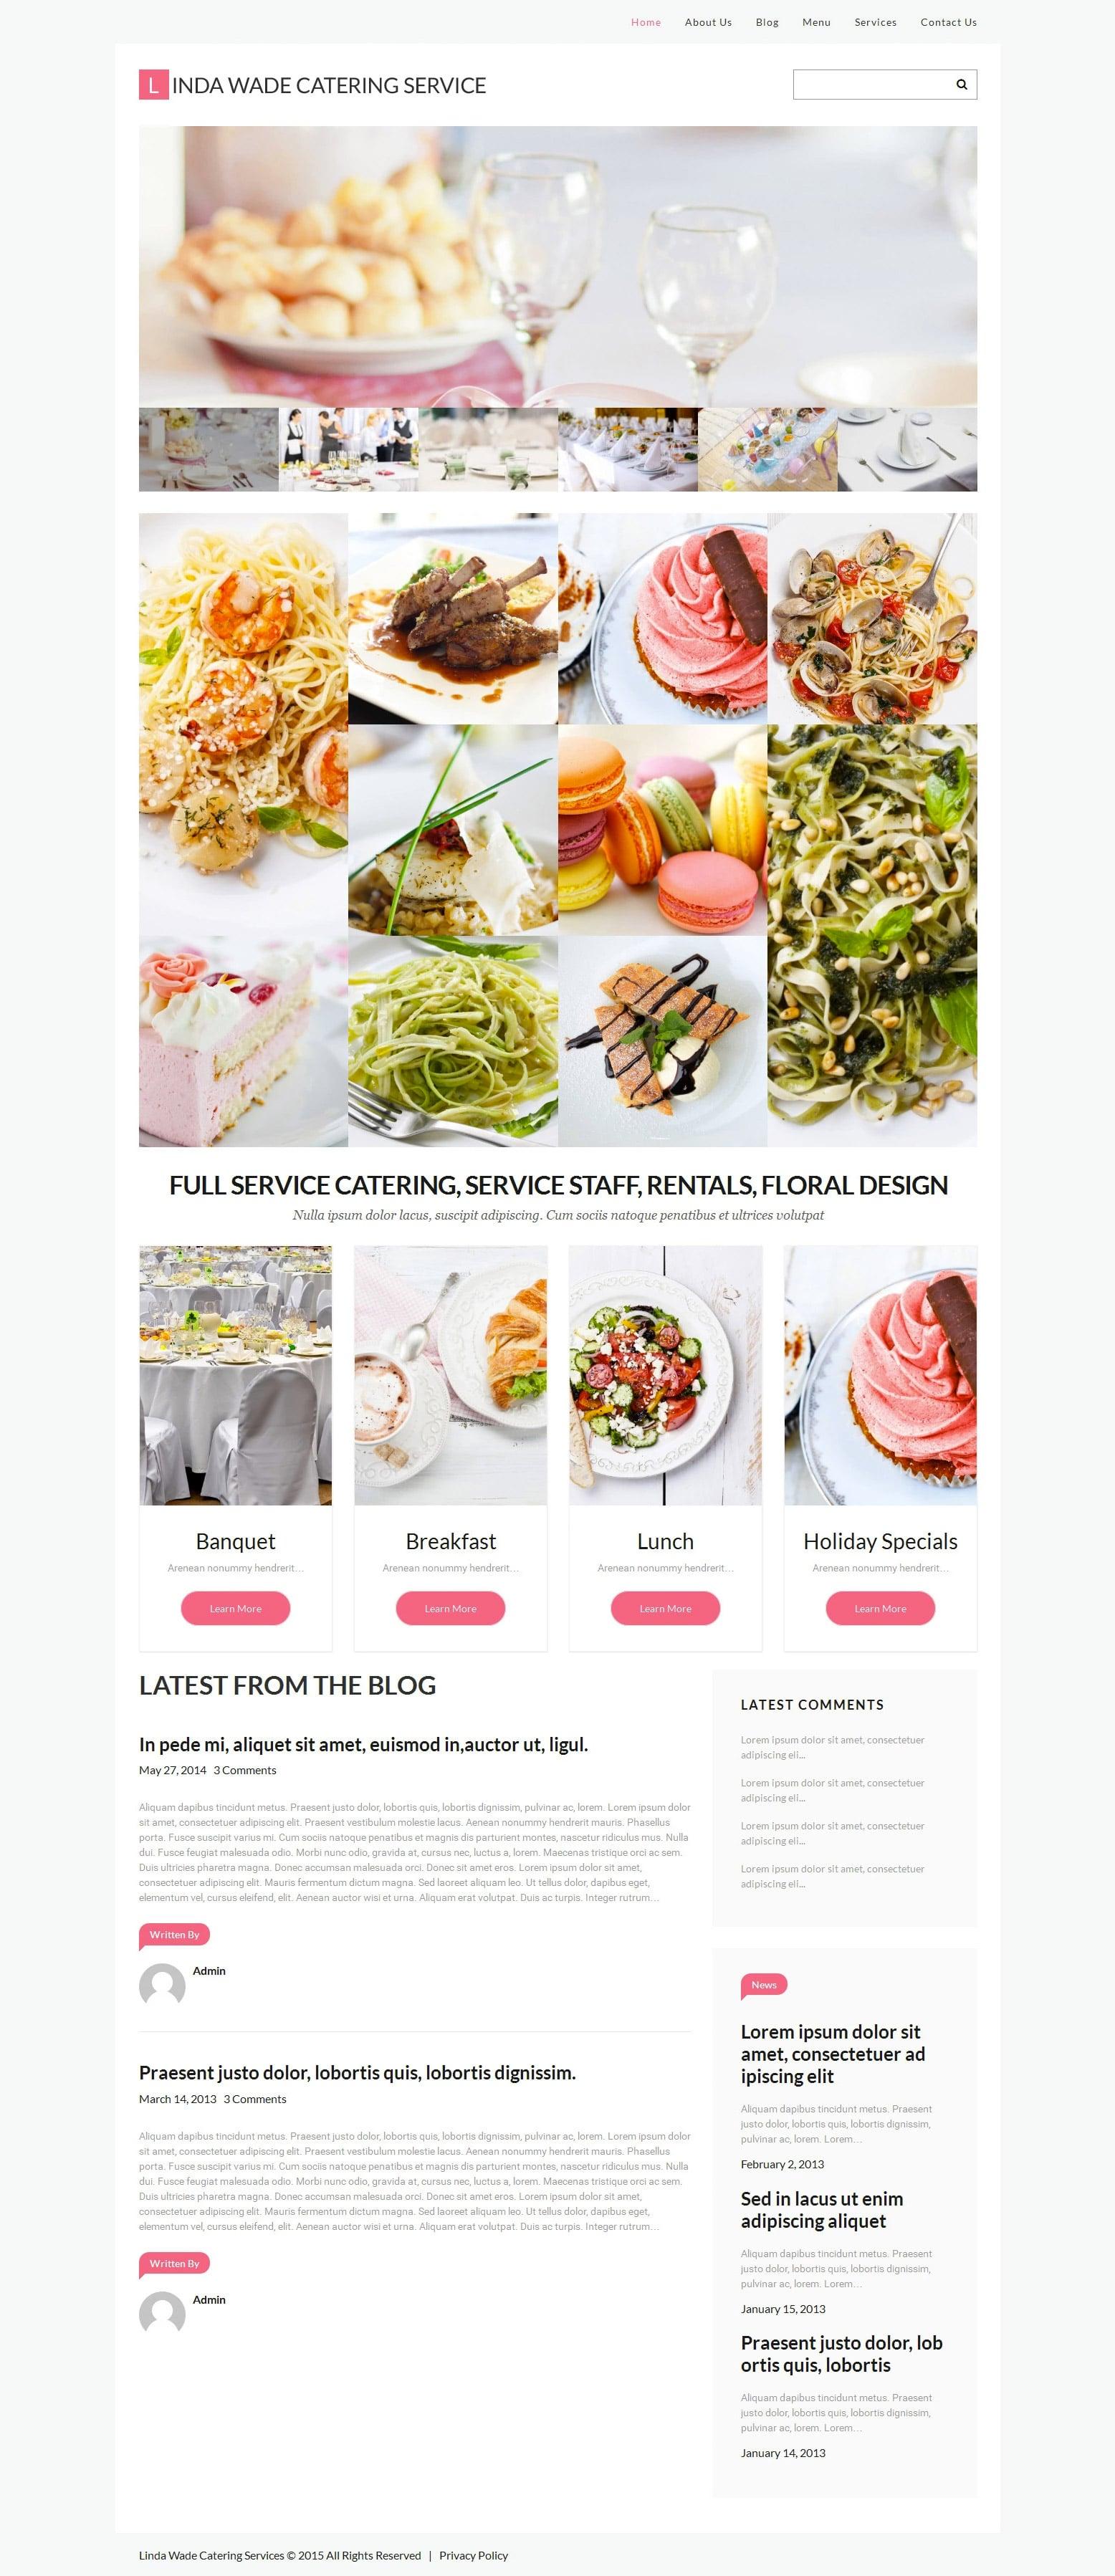 WordPress Food Blog Themes - 10 Premium WP Templates - Untitled 9